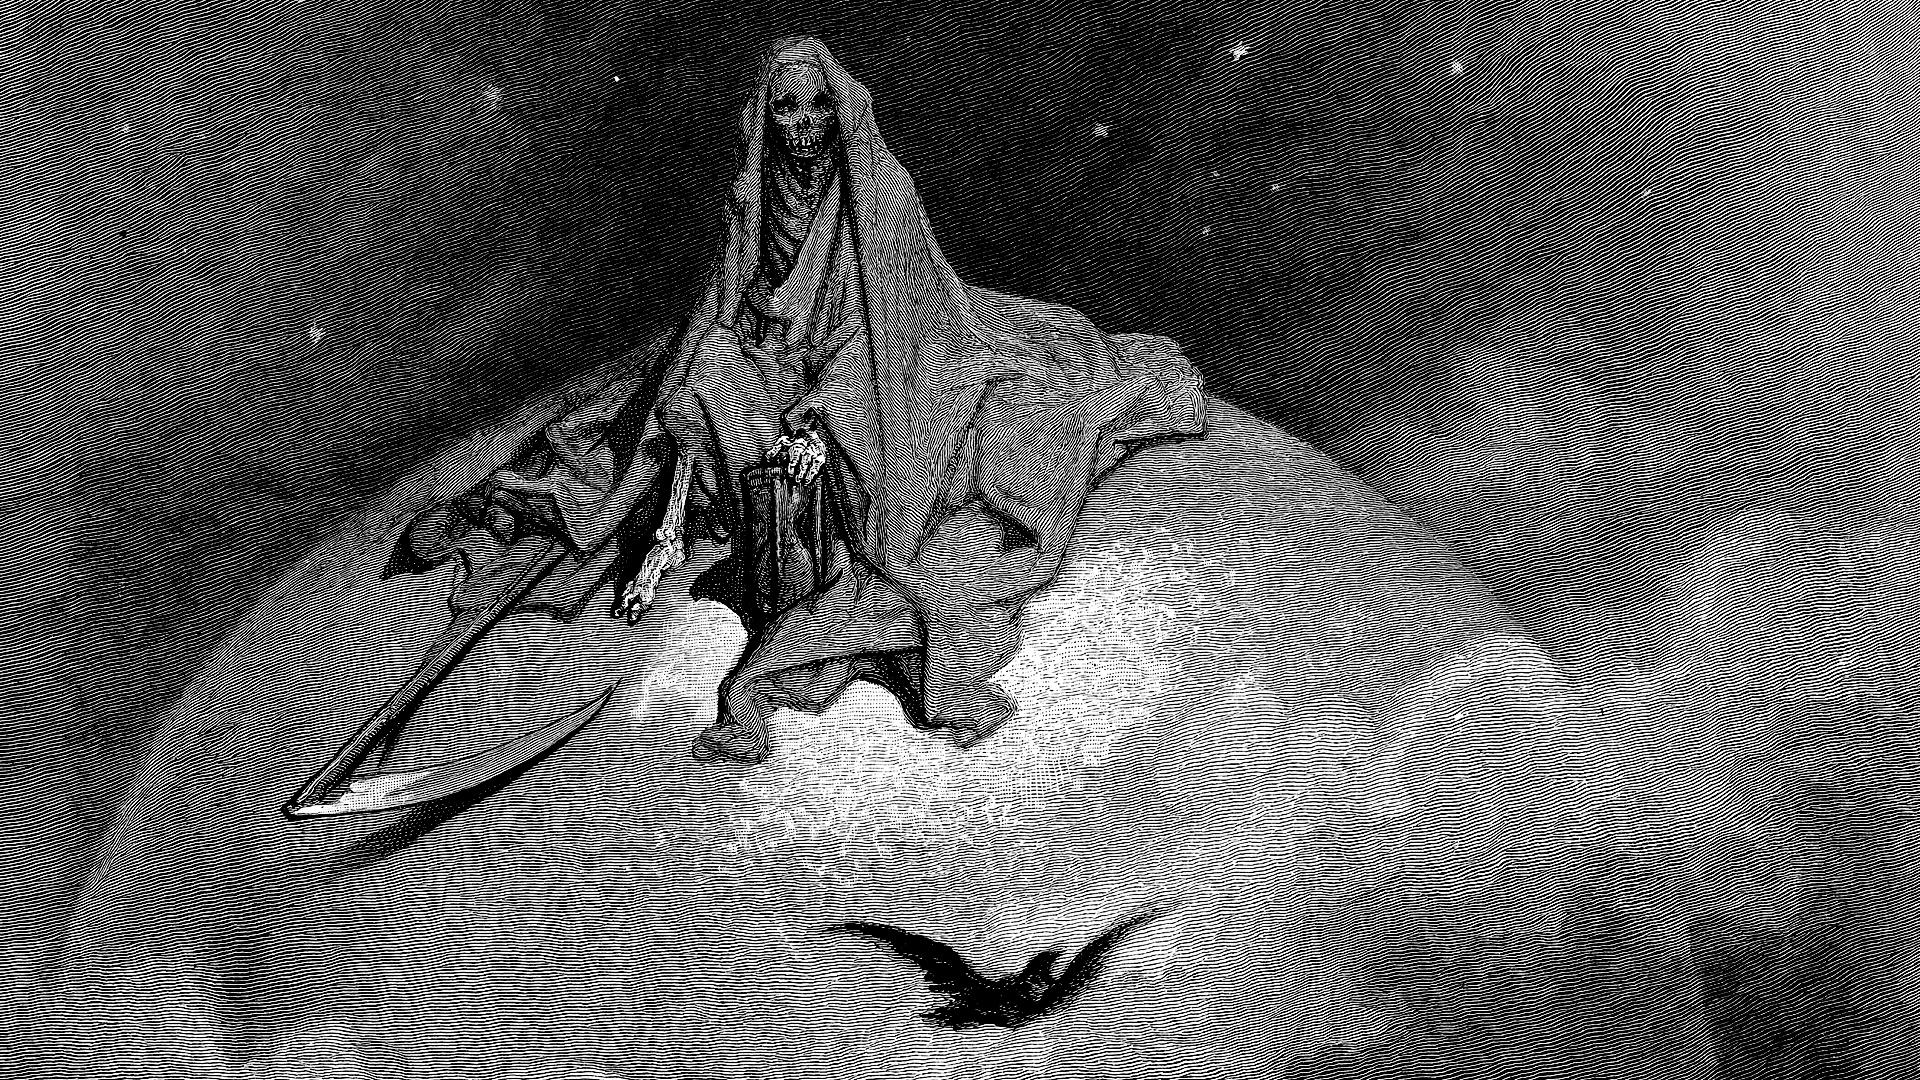 General 1920x1080 Gustave Doré illustration classic art death lithograph